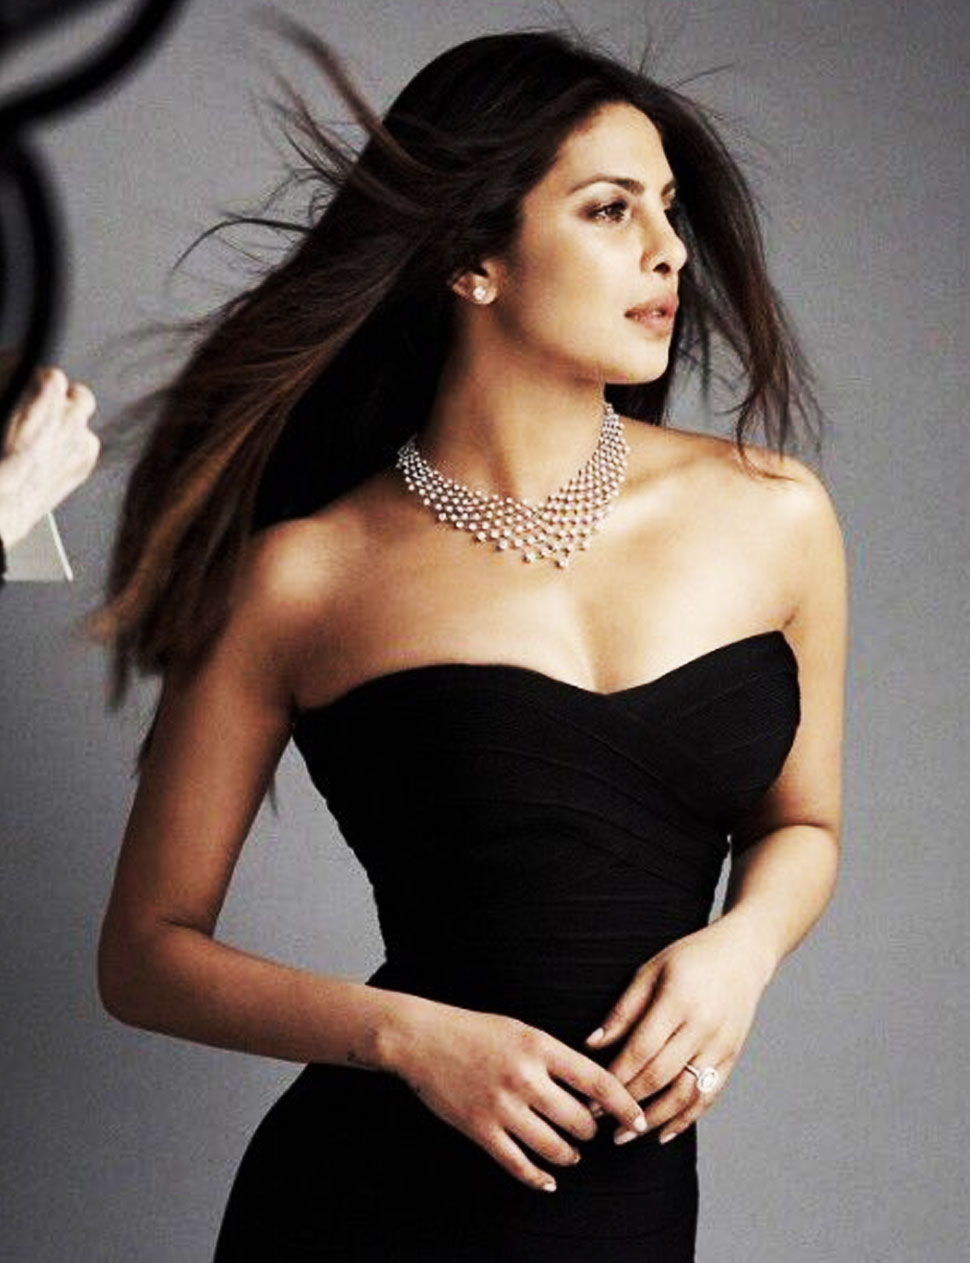 Most searched female celebrities 2017: Sunny Leone tops Yahoo India list, Priyanka Chopra and Aishwarya Rai follow